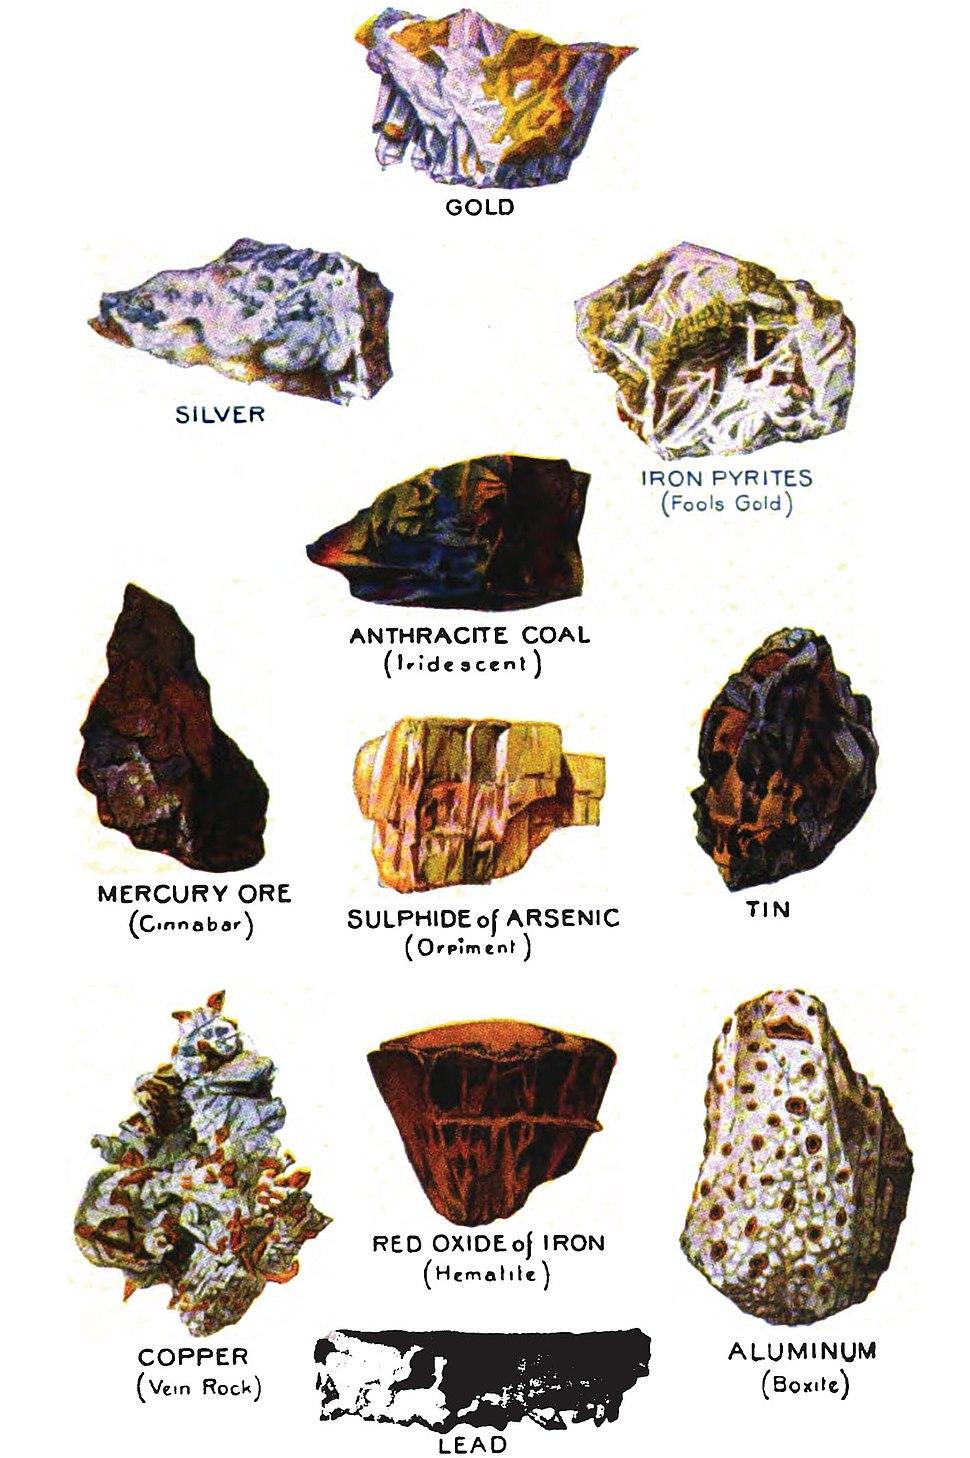 Americana 1920 Mineralogy - Valuable Minerals